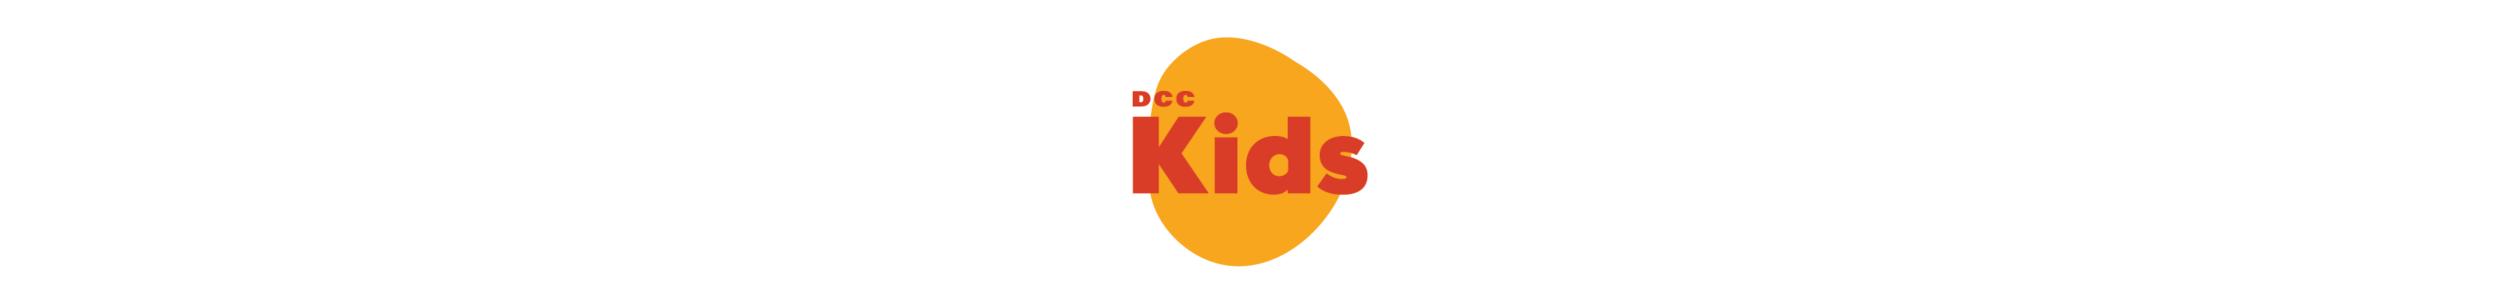 DCC Kids Fotter.png